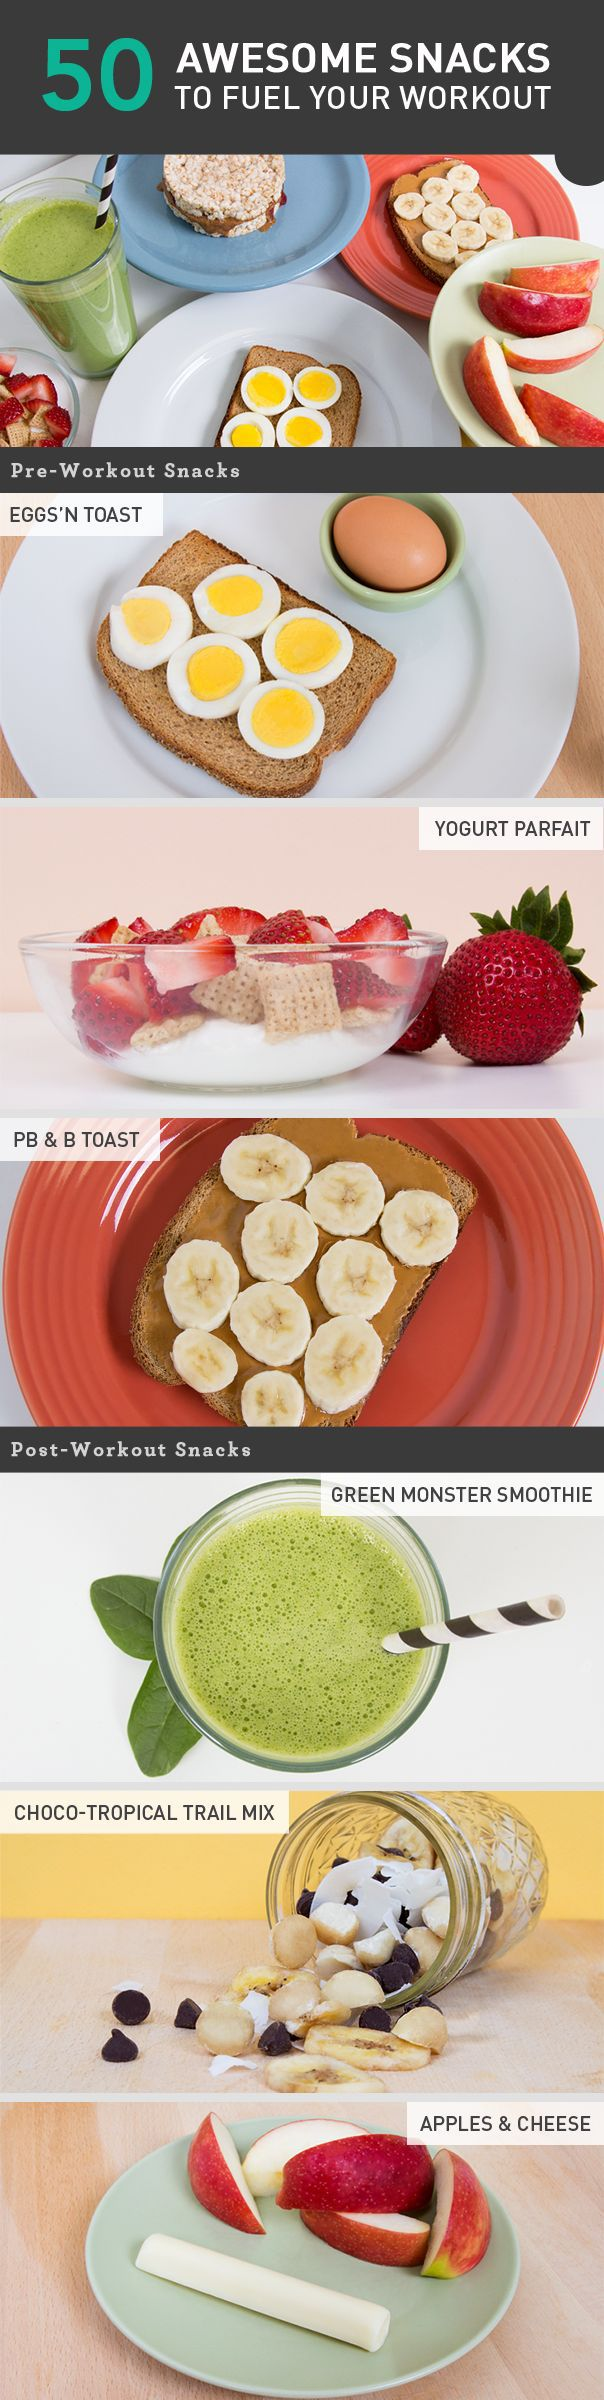 Diet plan to get abs